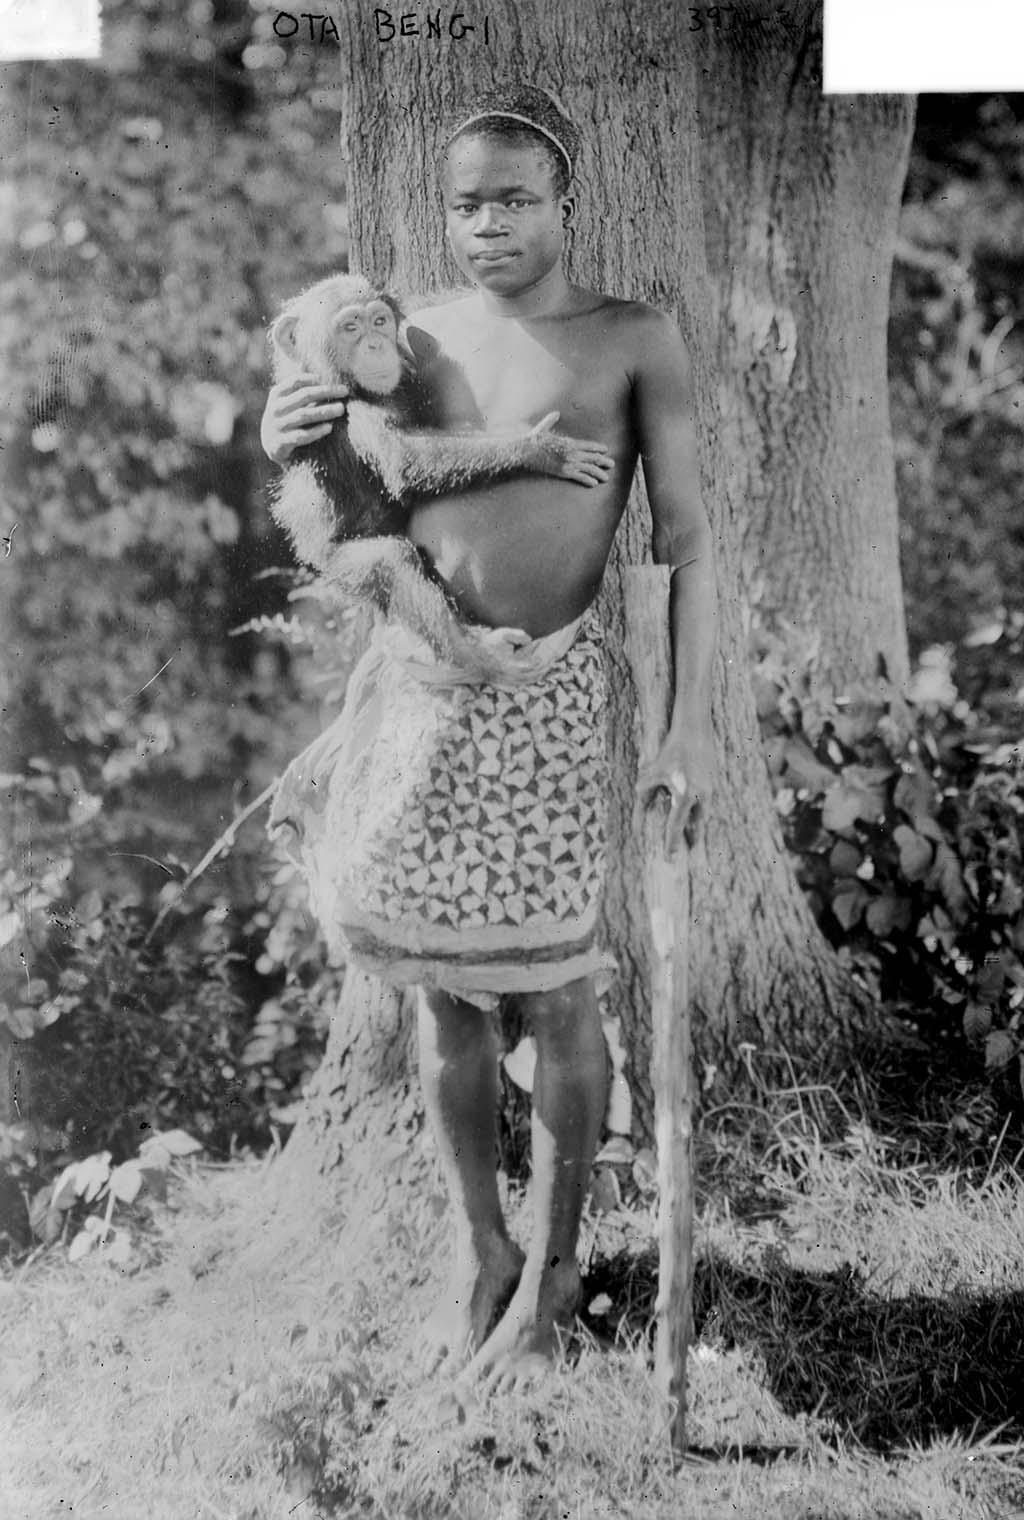 Ota Benga (1883-1916) •